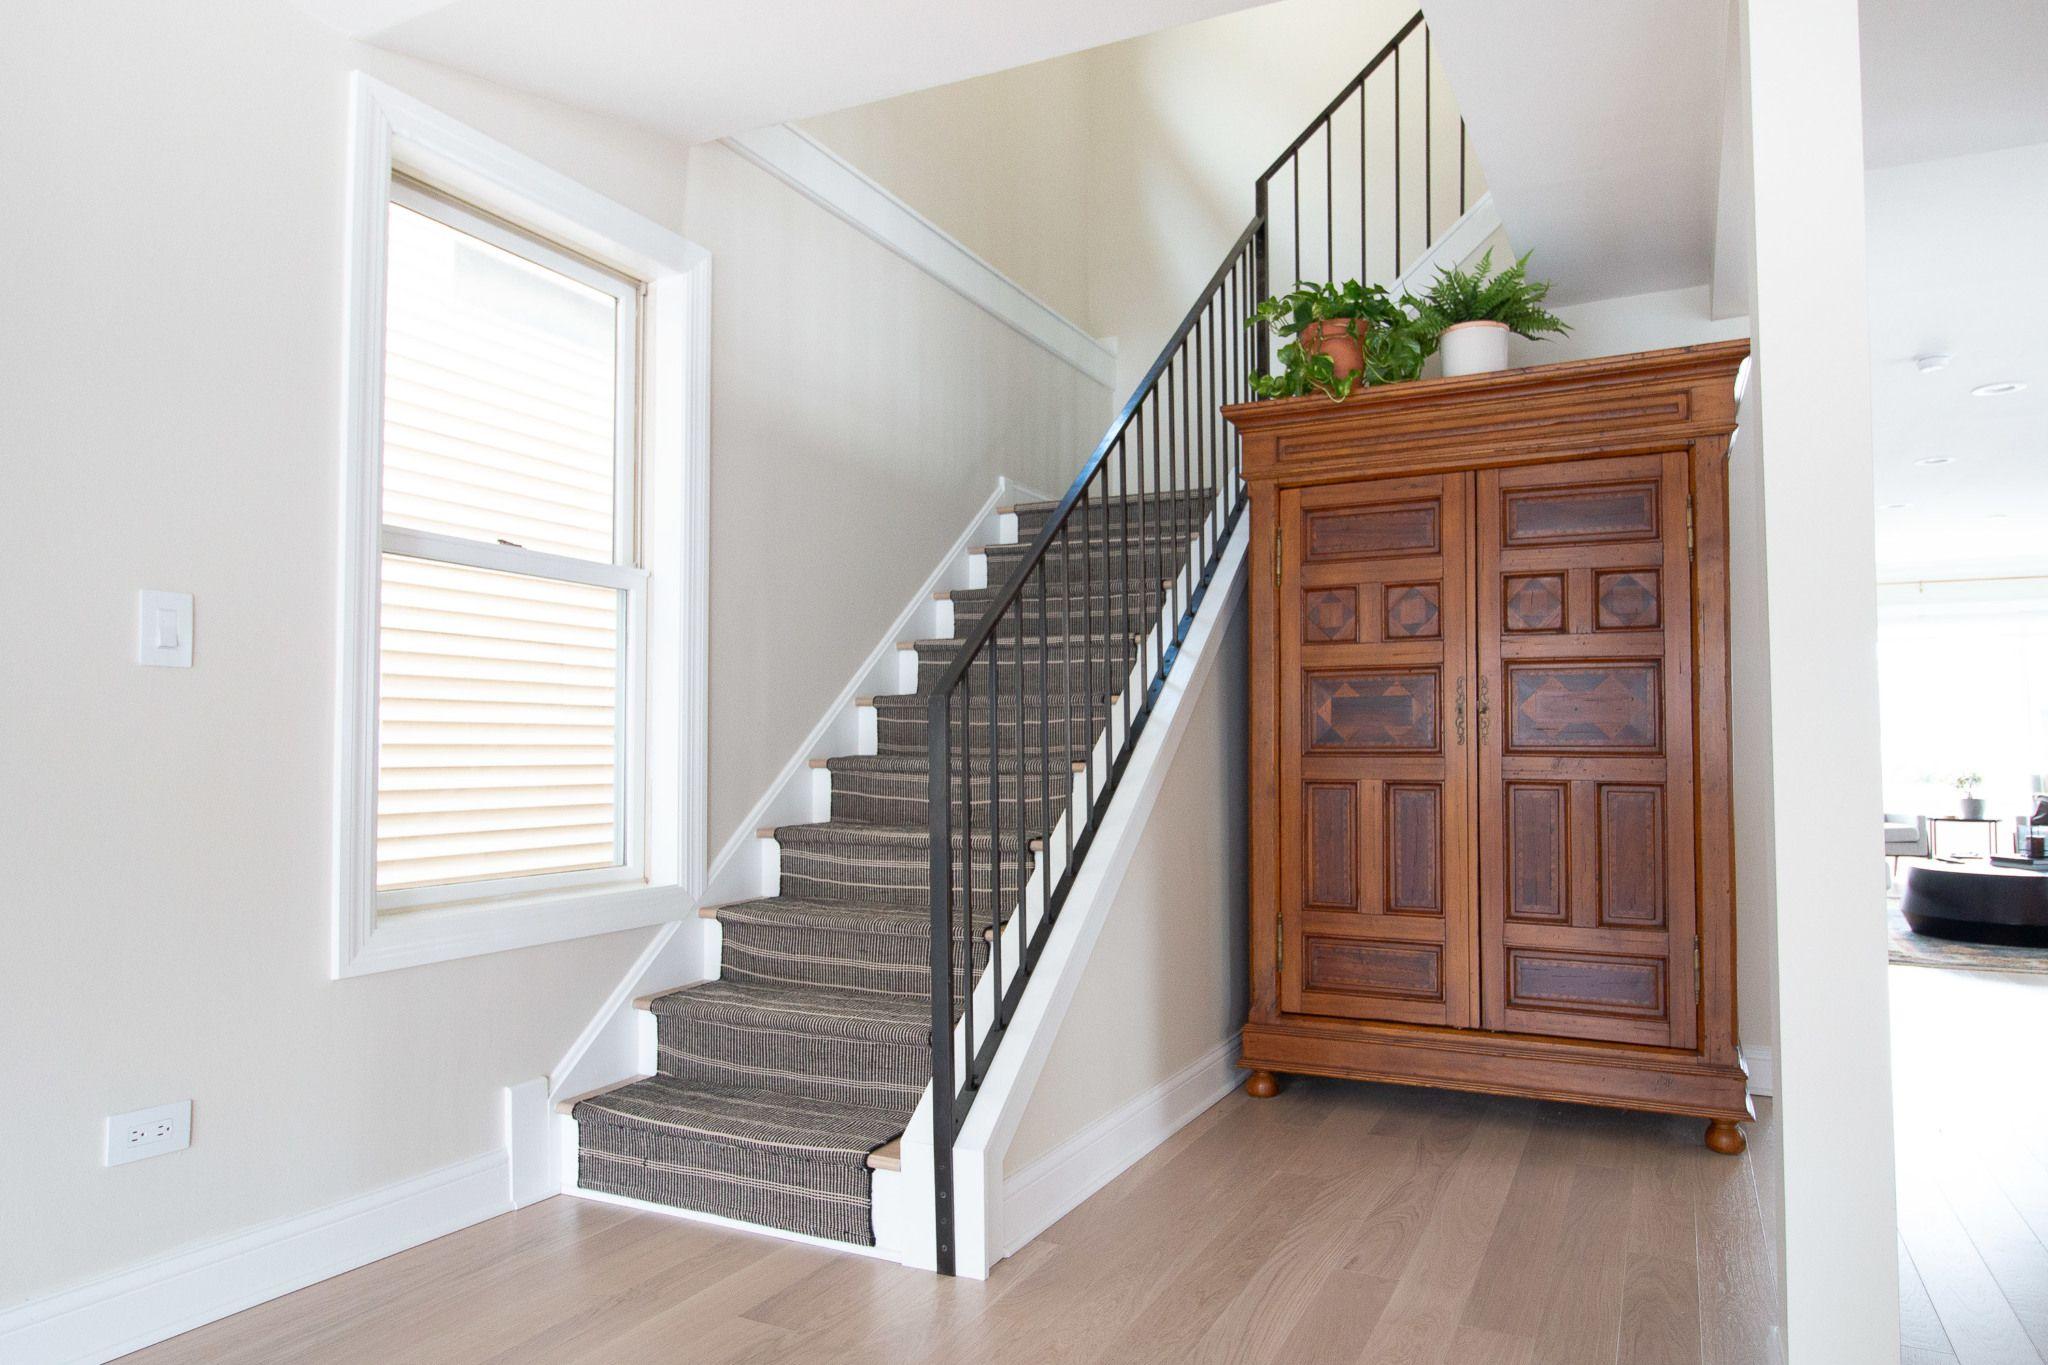 Best How To Install A Stair Runner In 2020 Stair Runner Diy 400 x 300